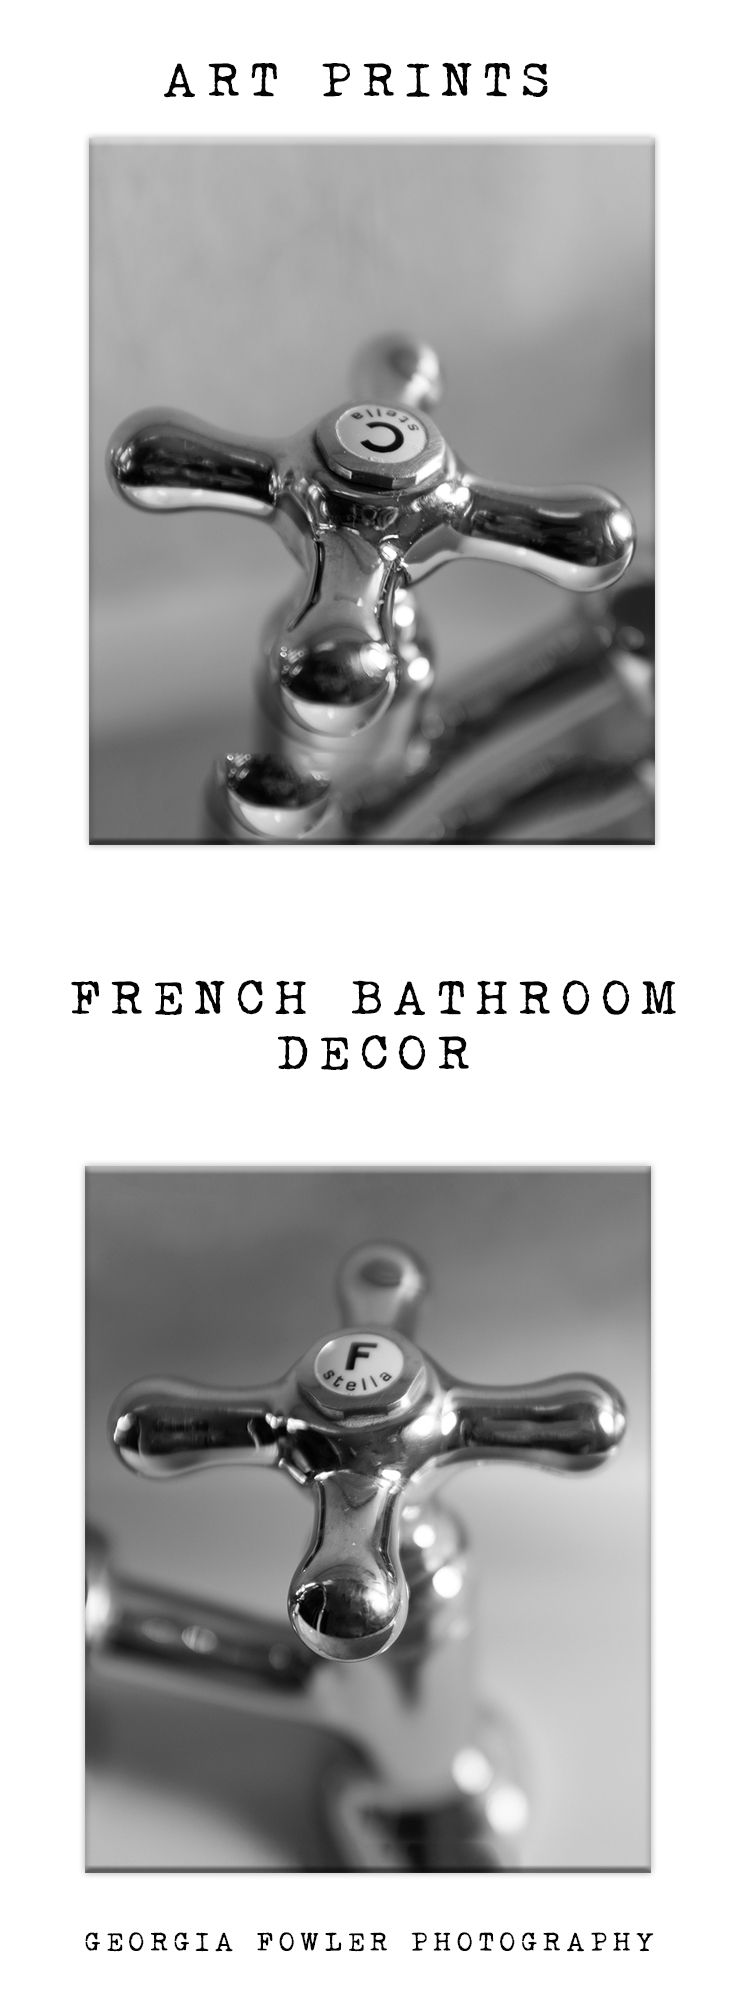 Bathroom Wall Art, Bathroom Prints, Set Of 2 Laundry Room Photos, Faucet,